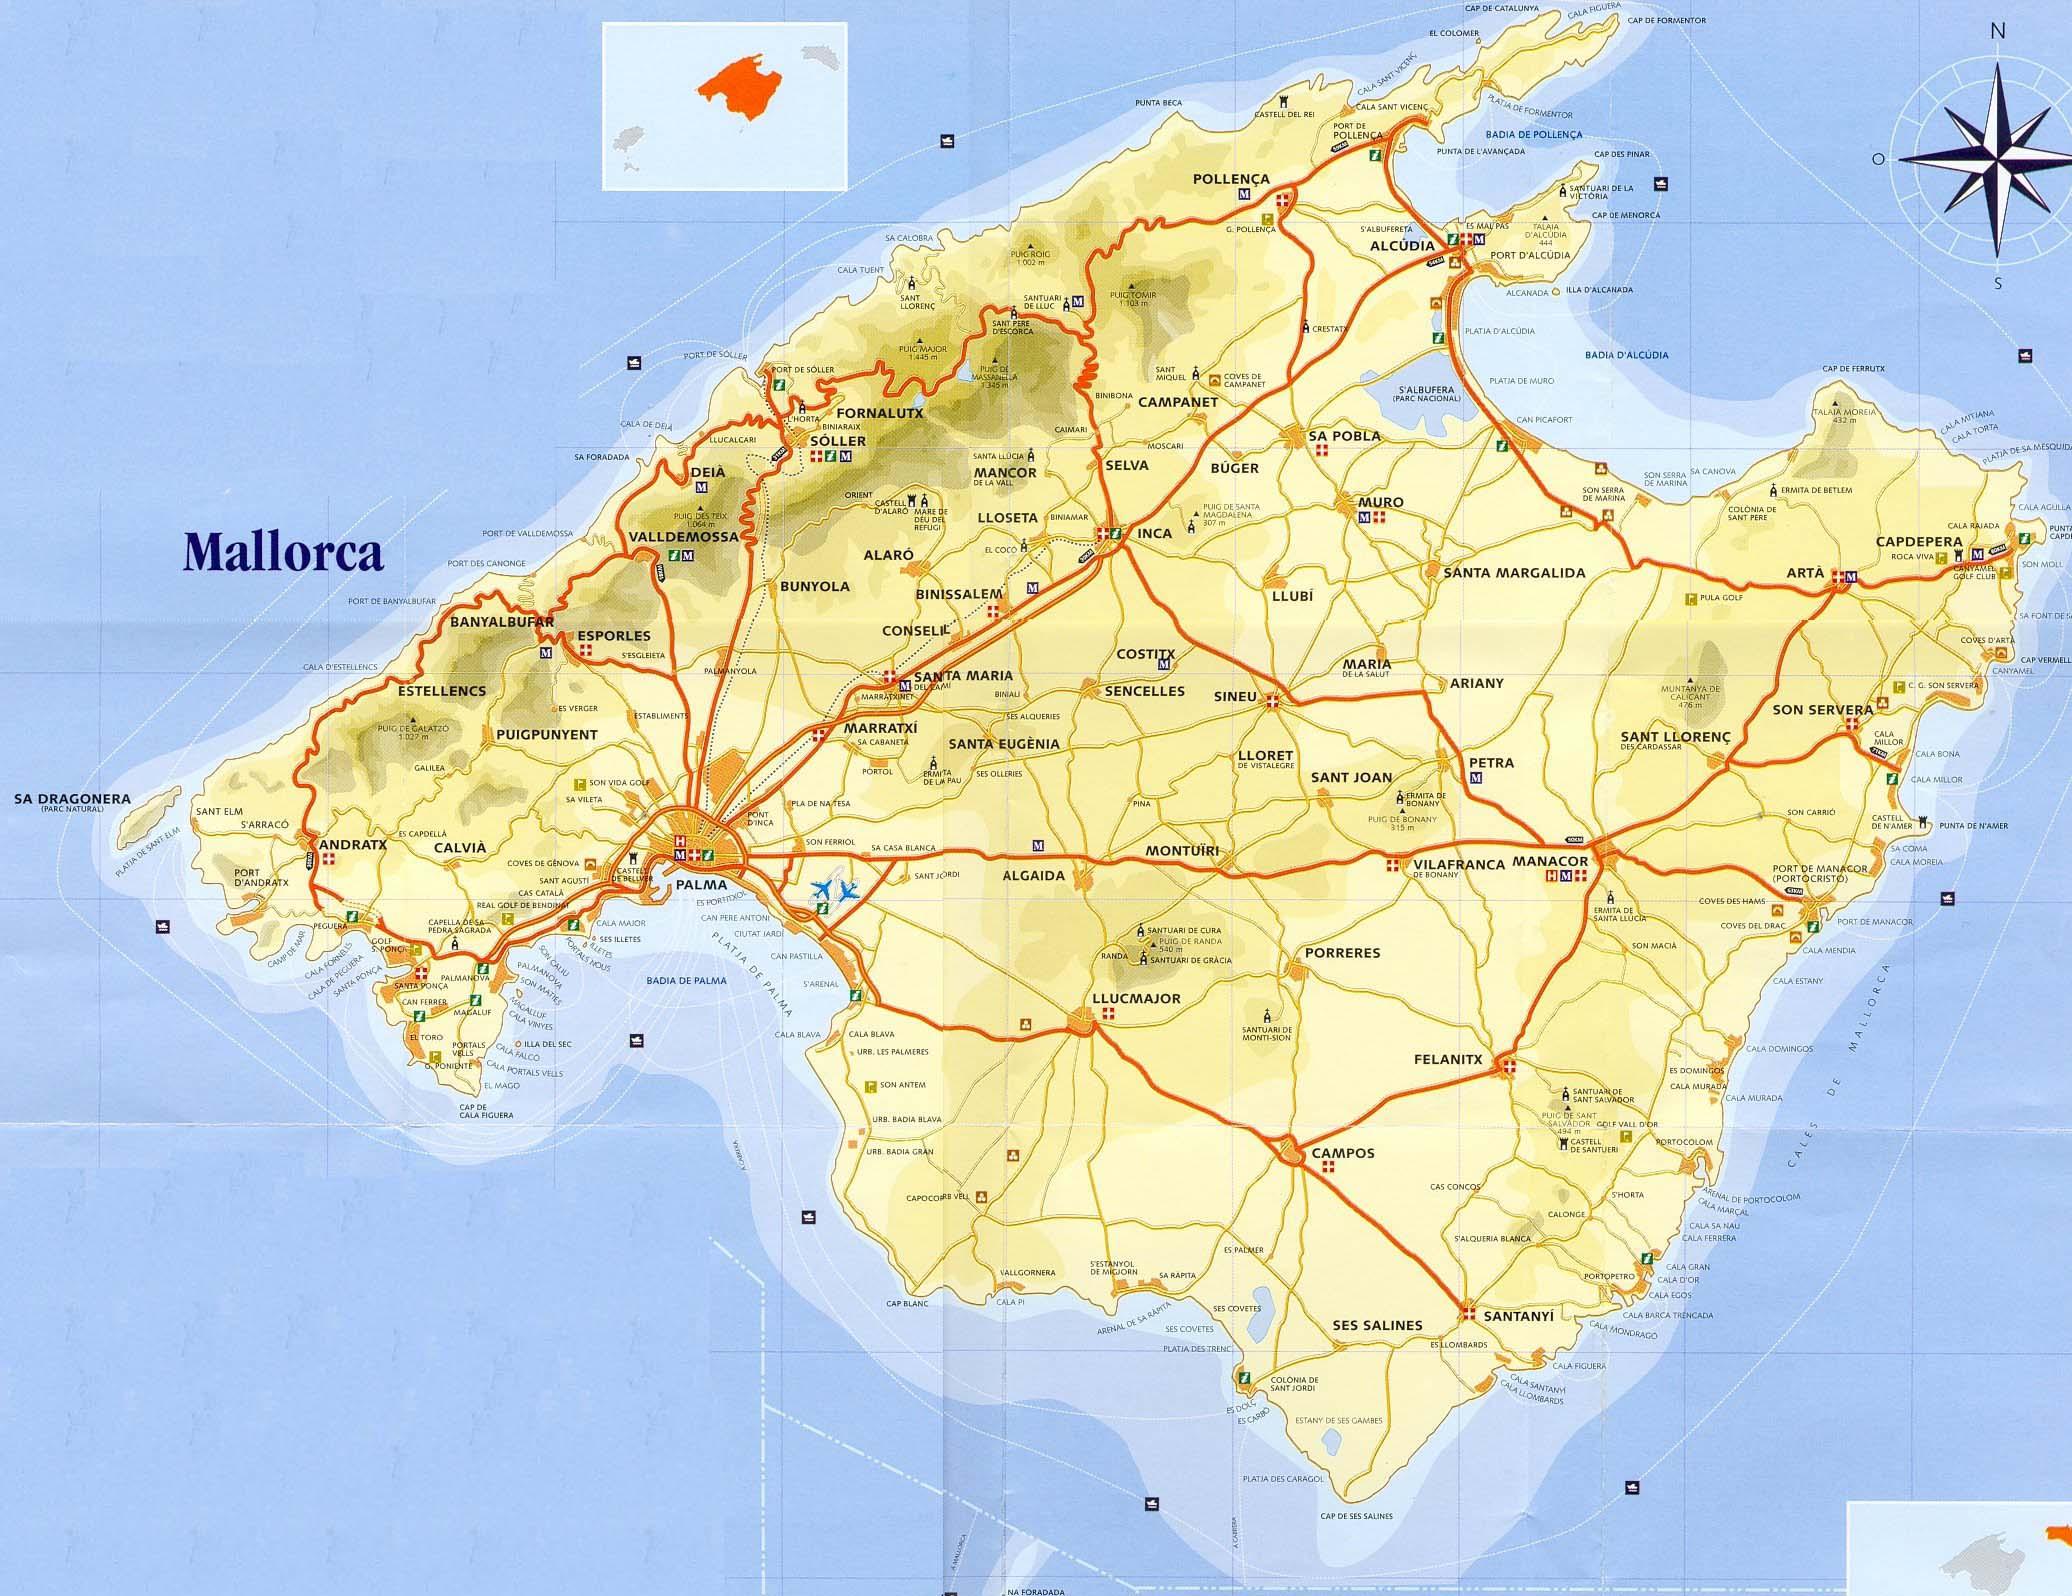 palma de maiorca mapa Large Mallorca Maps for Free Download and Print | High Resolution  palma de maiorca mapa